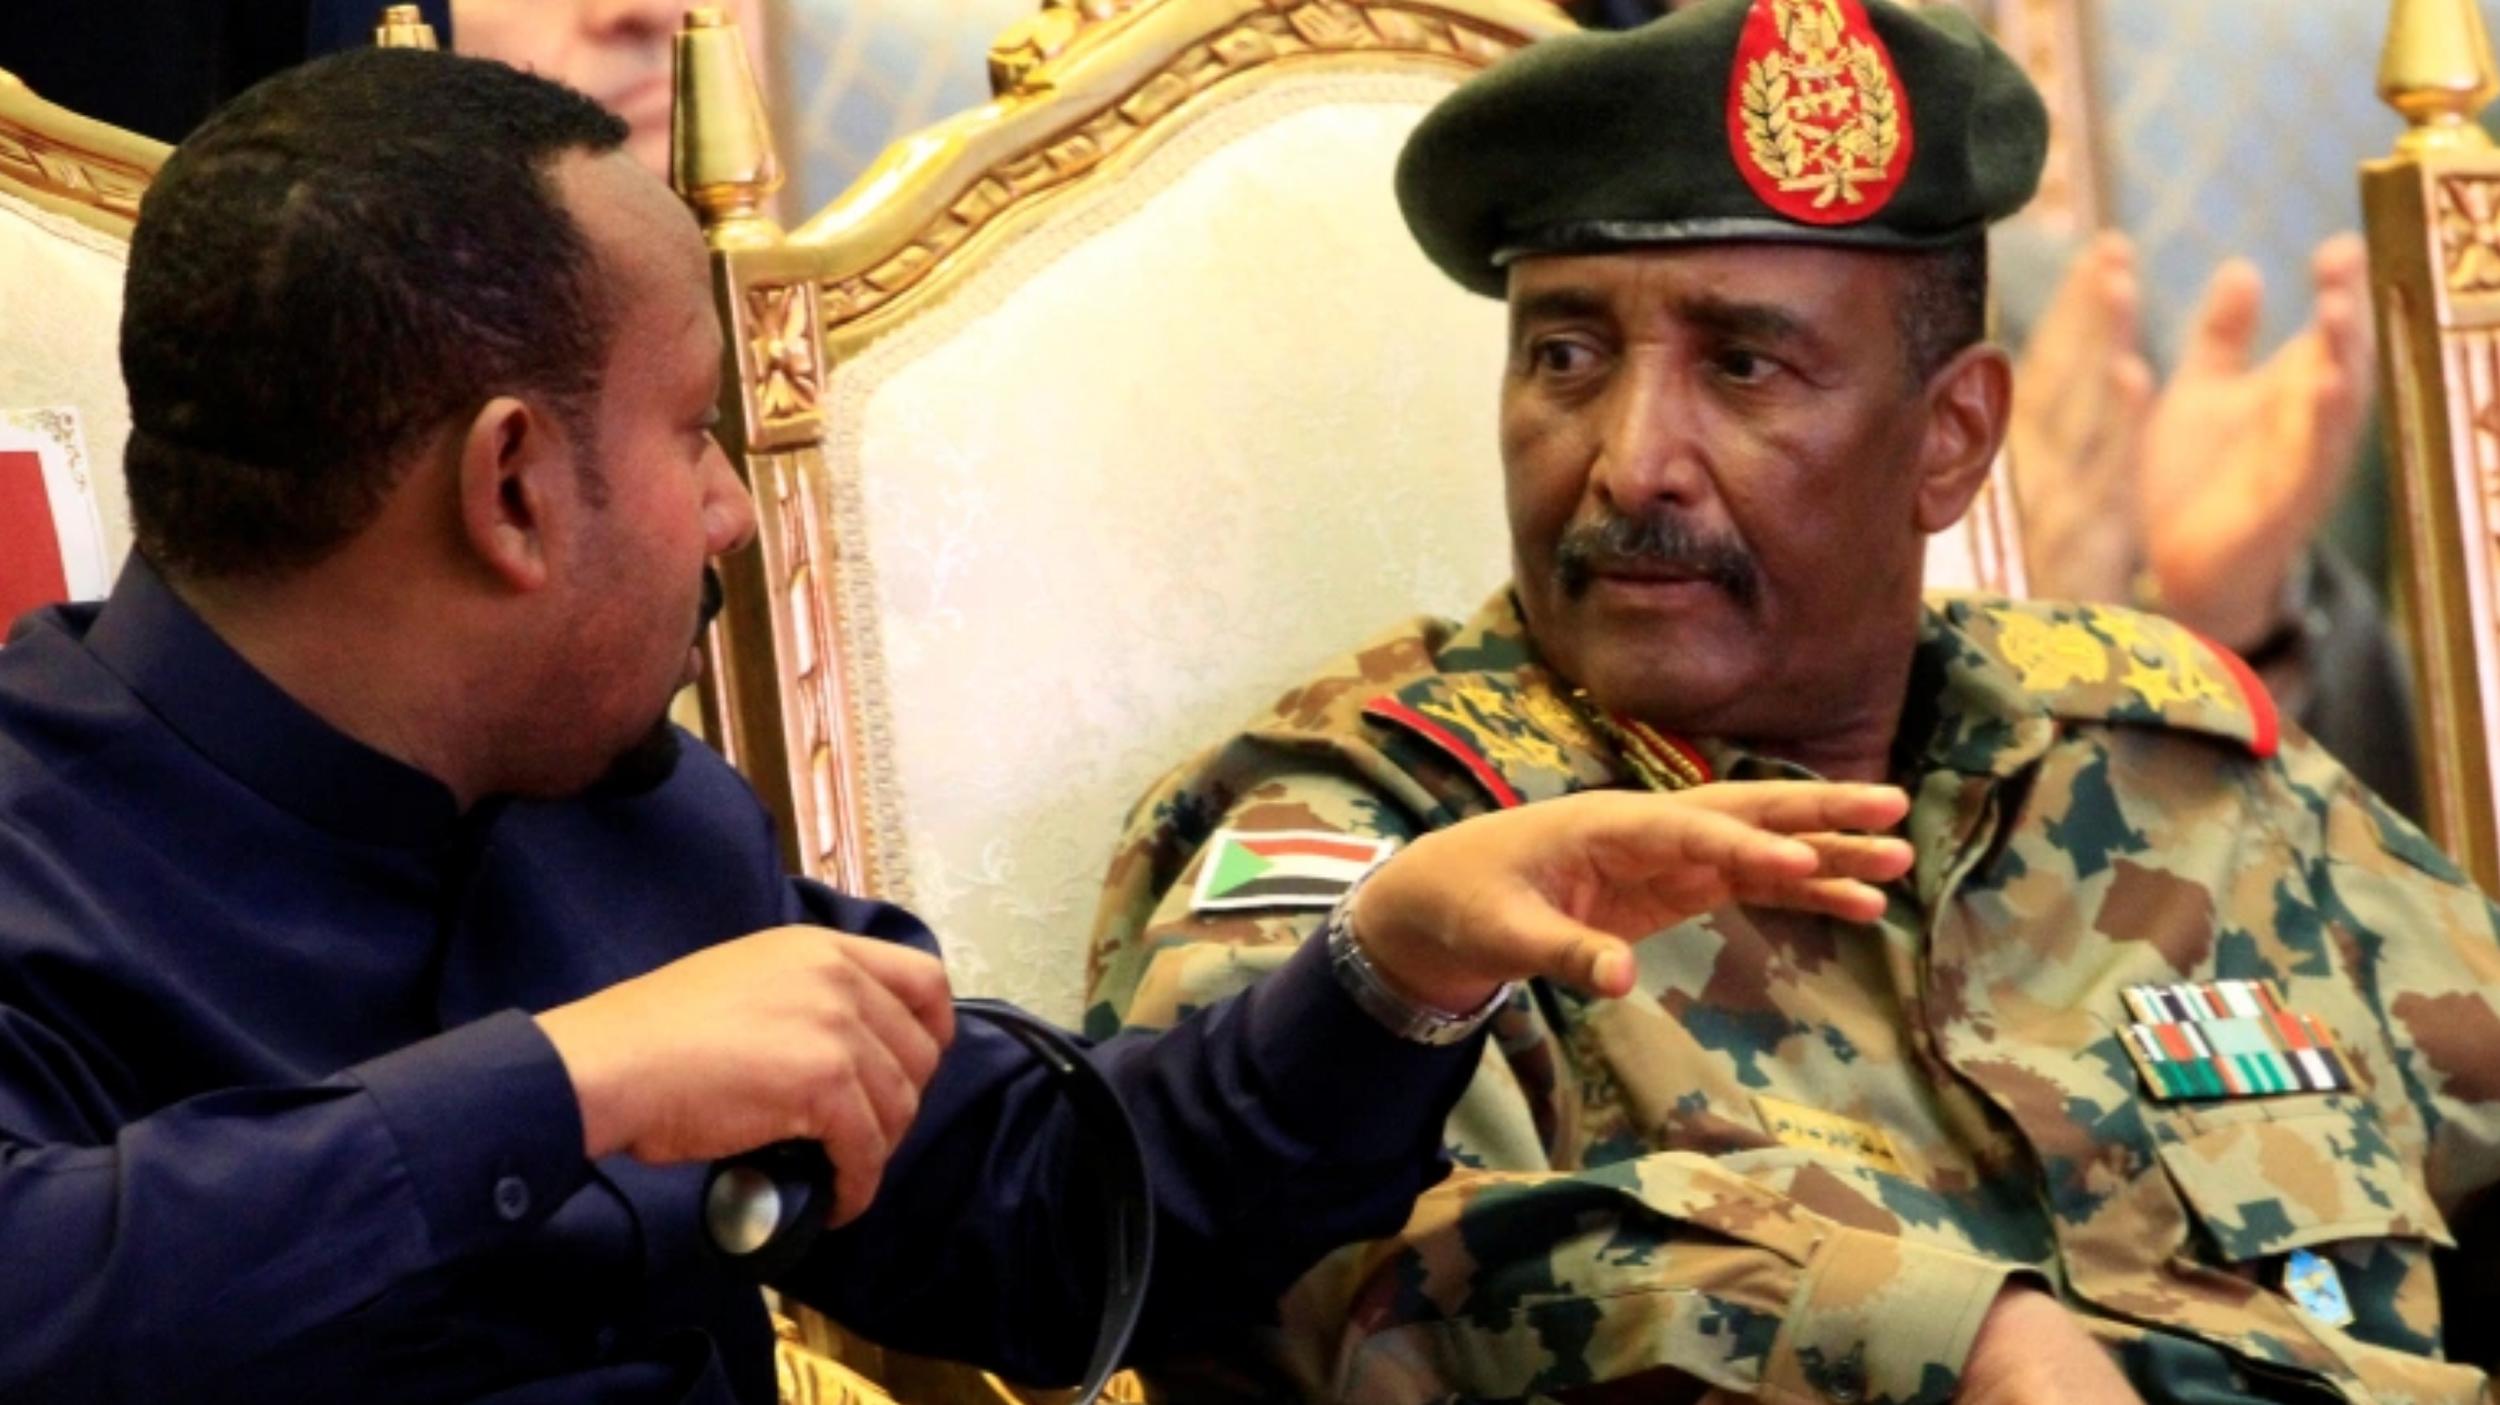 studies.aljazeera.net: A warm war: Sudan and Ethiopia on a collision course